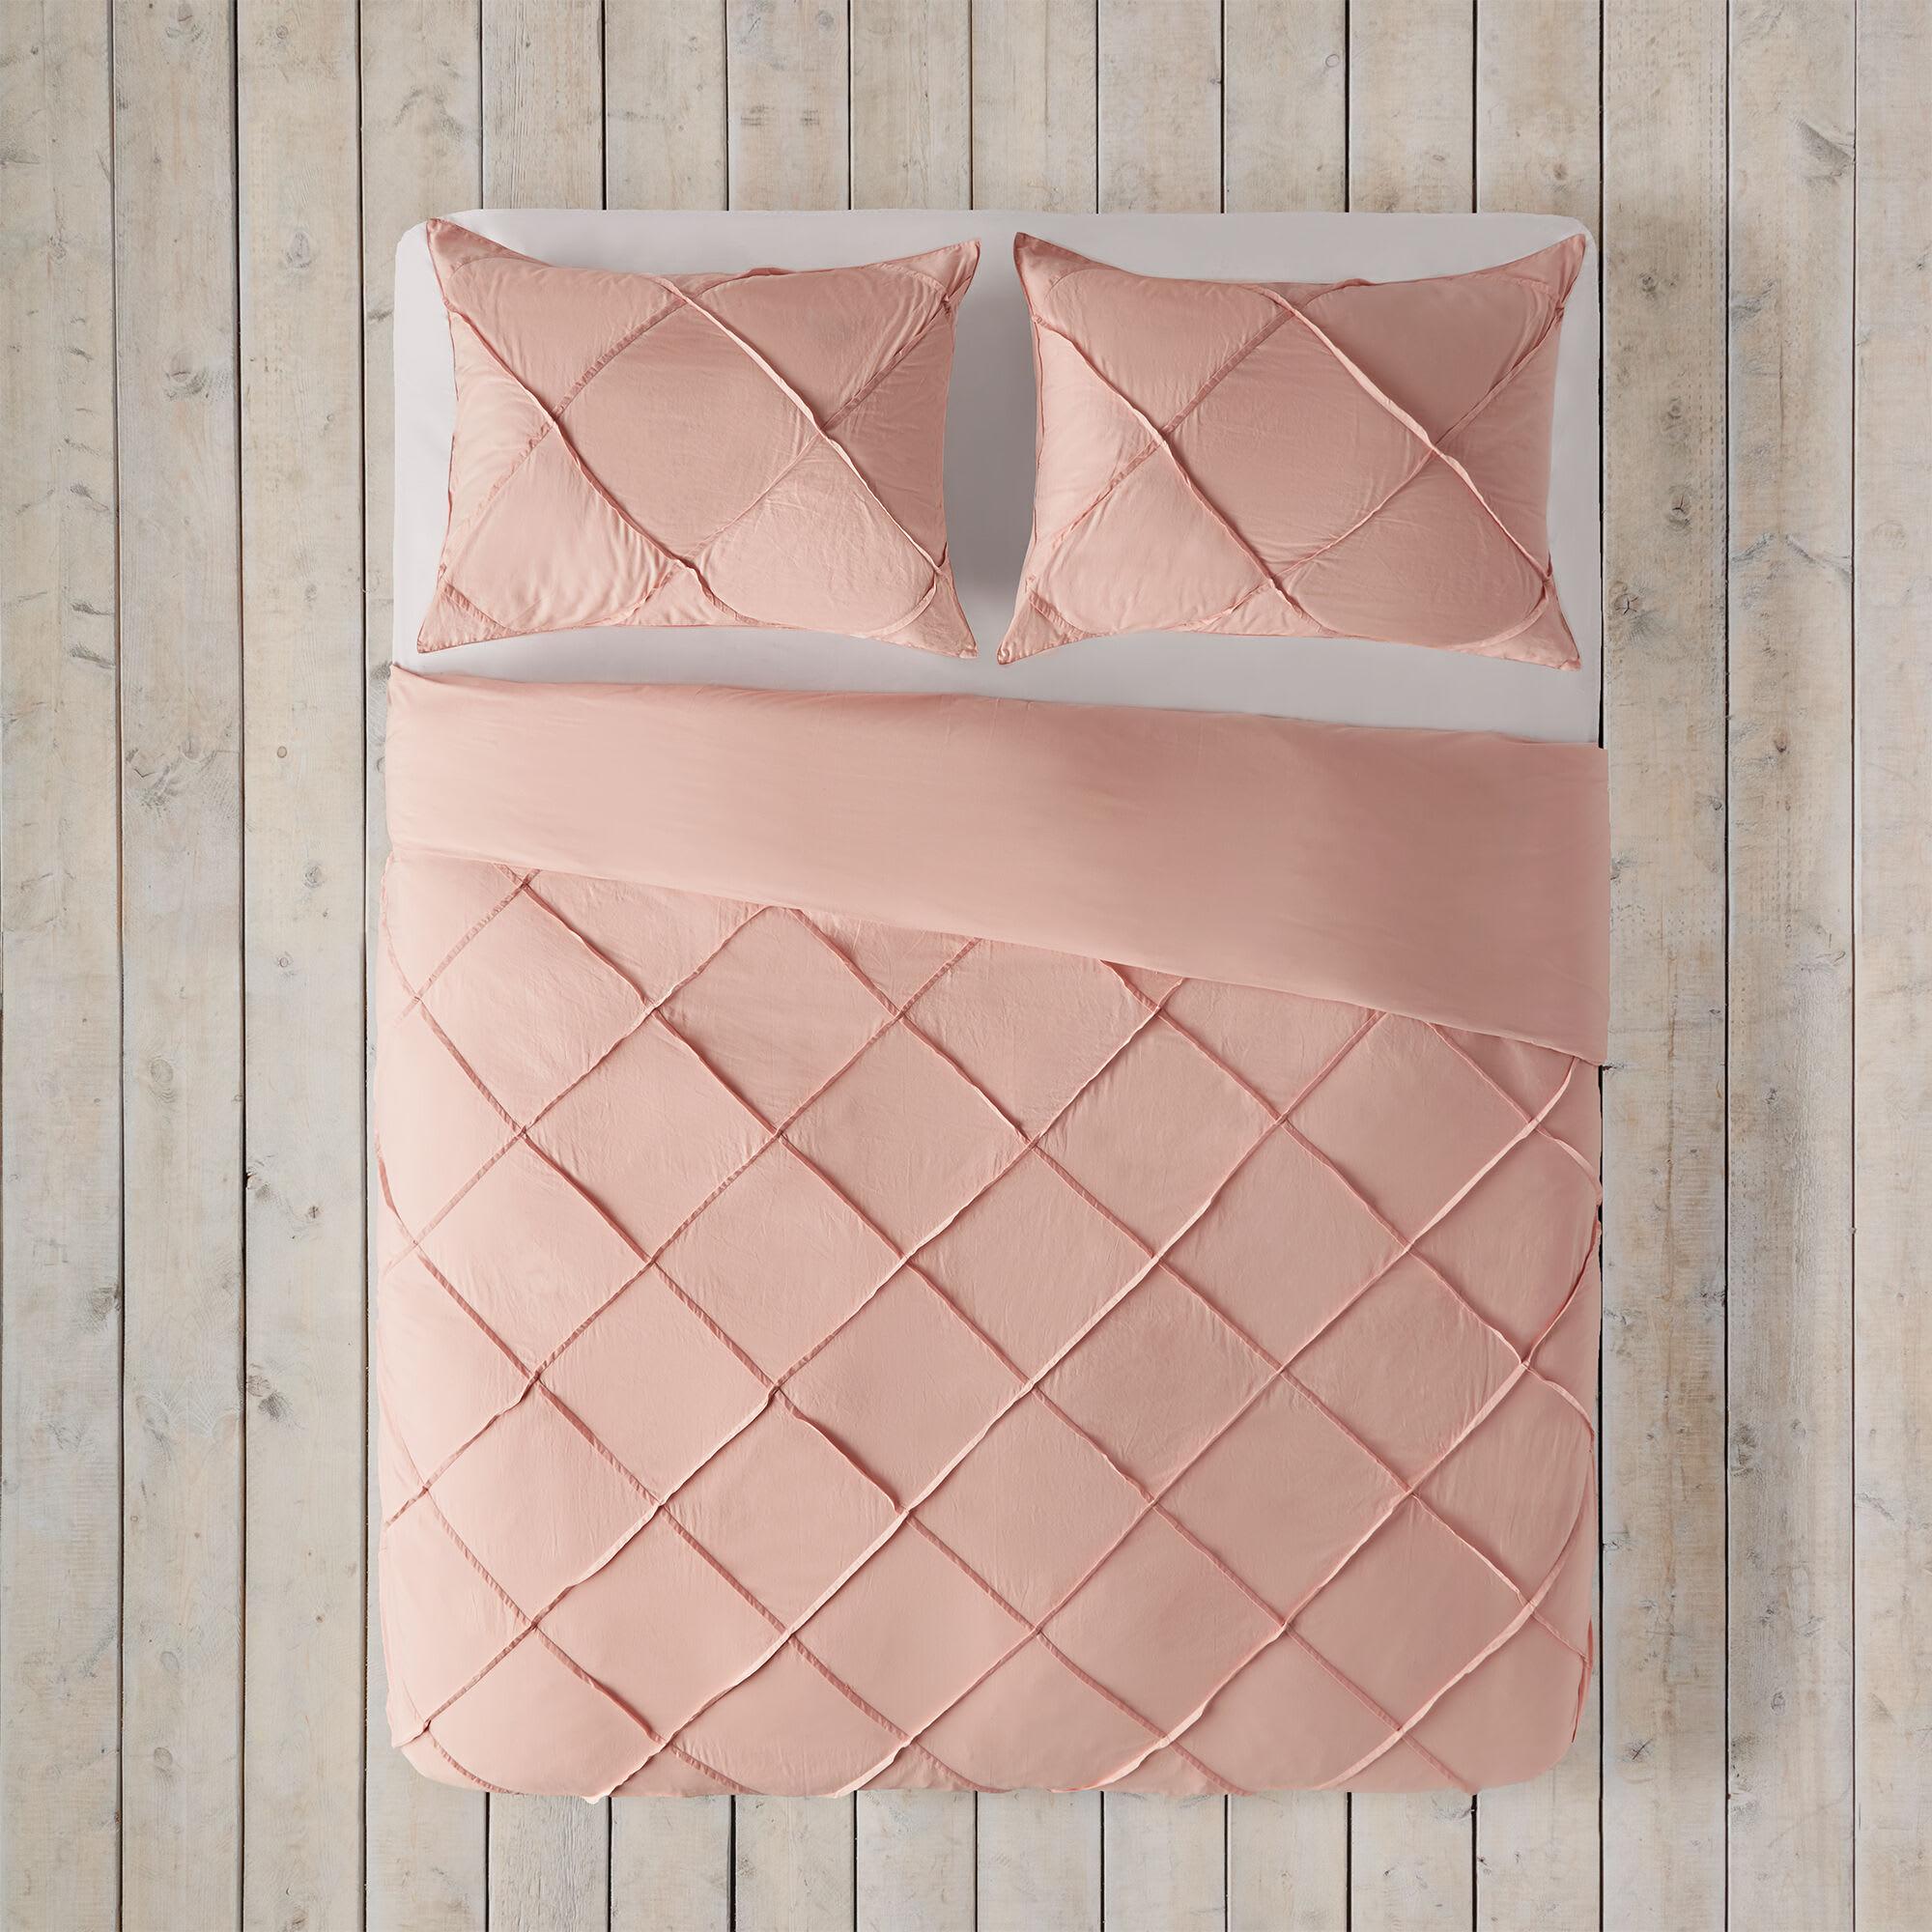 Laetitia Collection - Duvet Cover Set